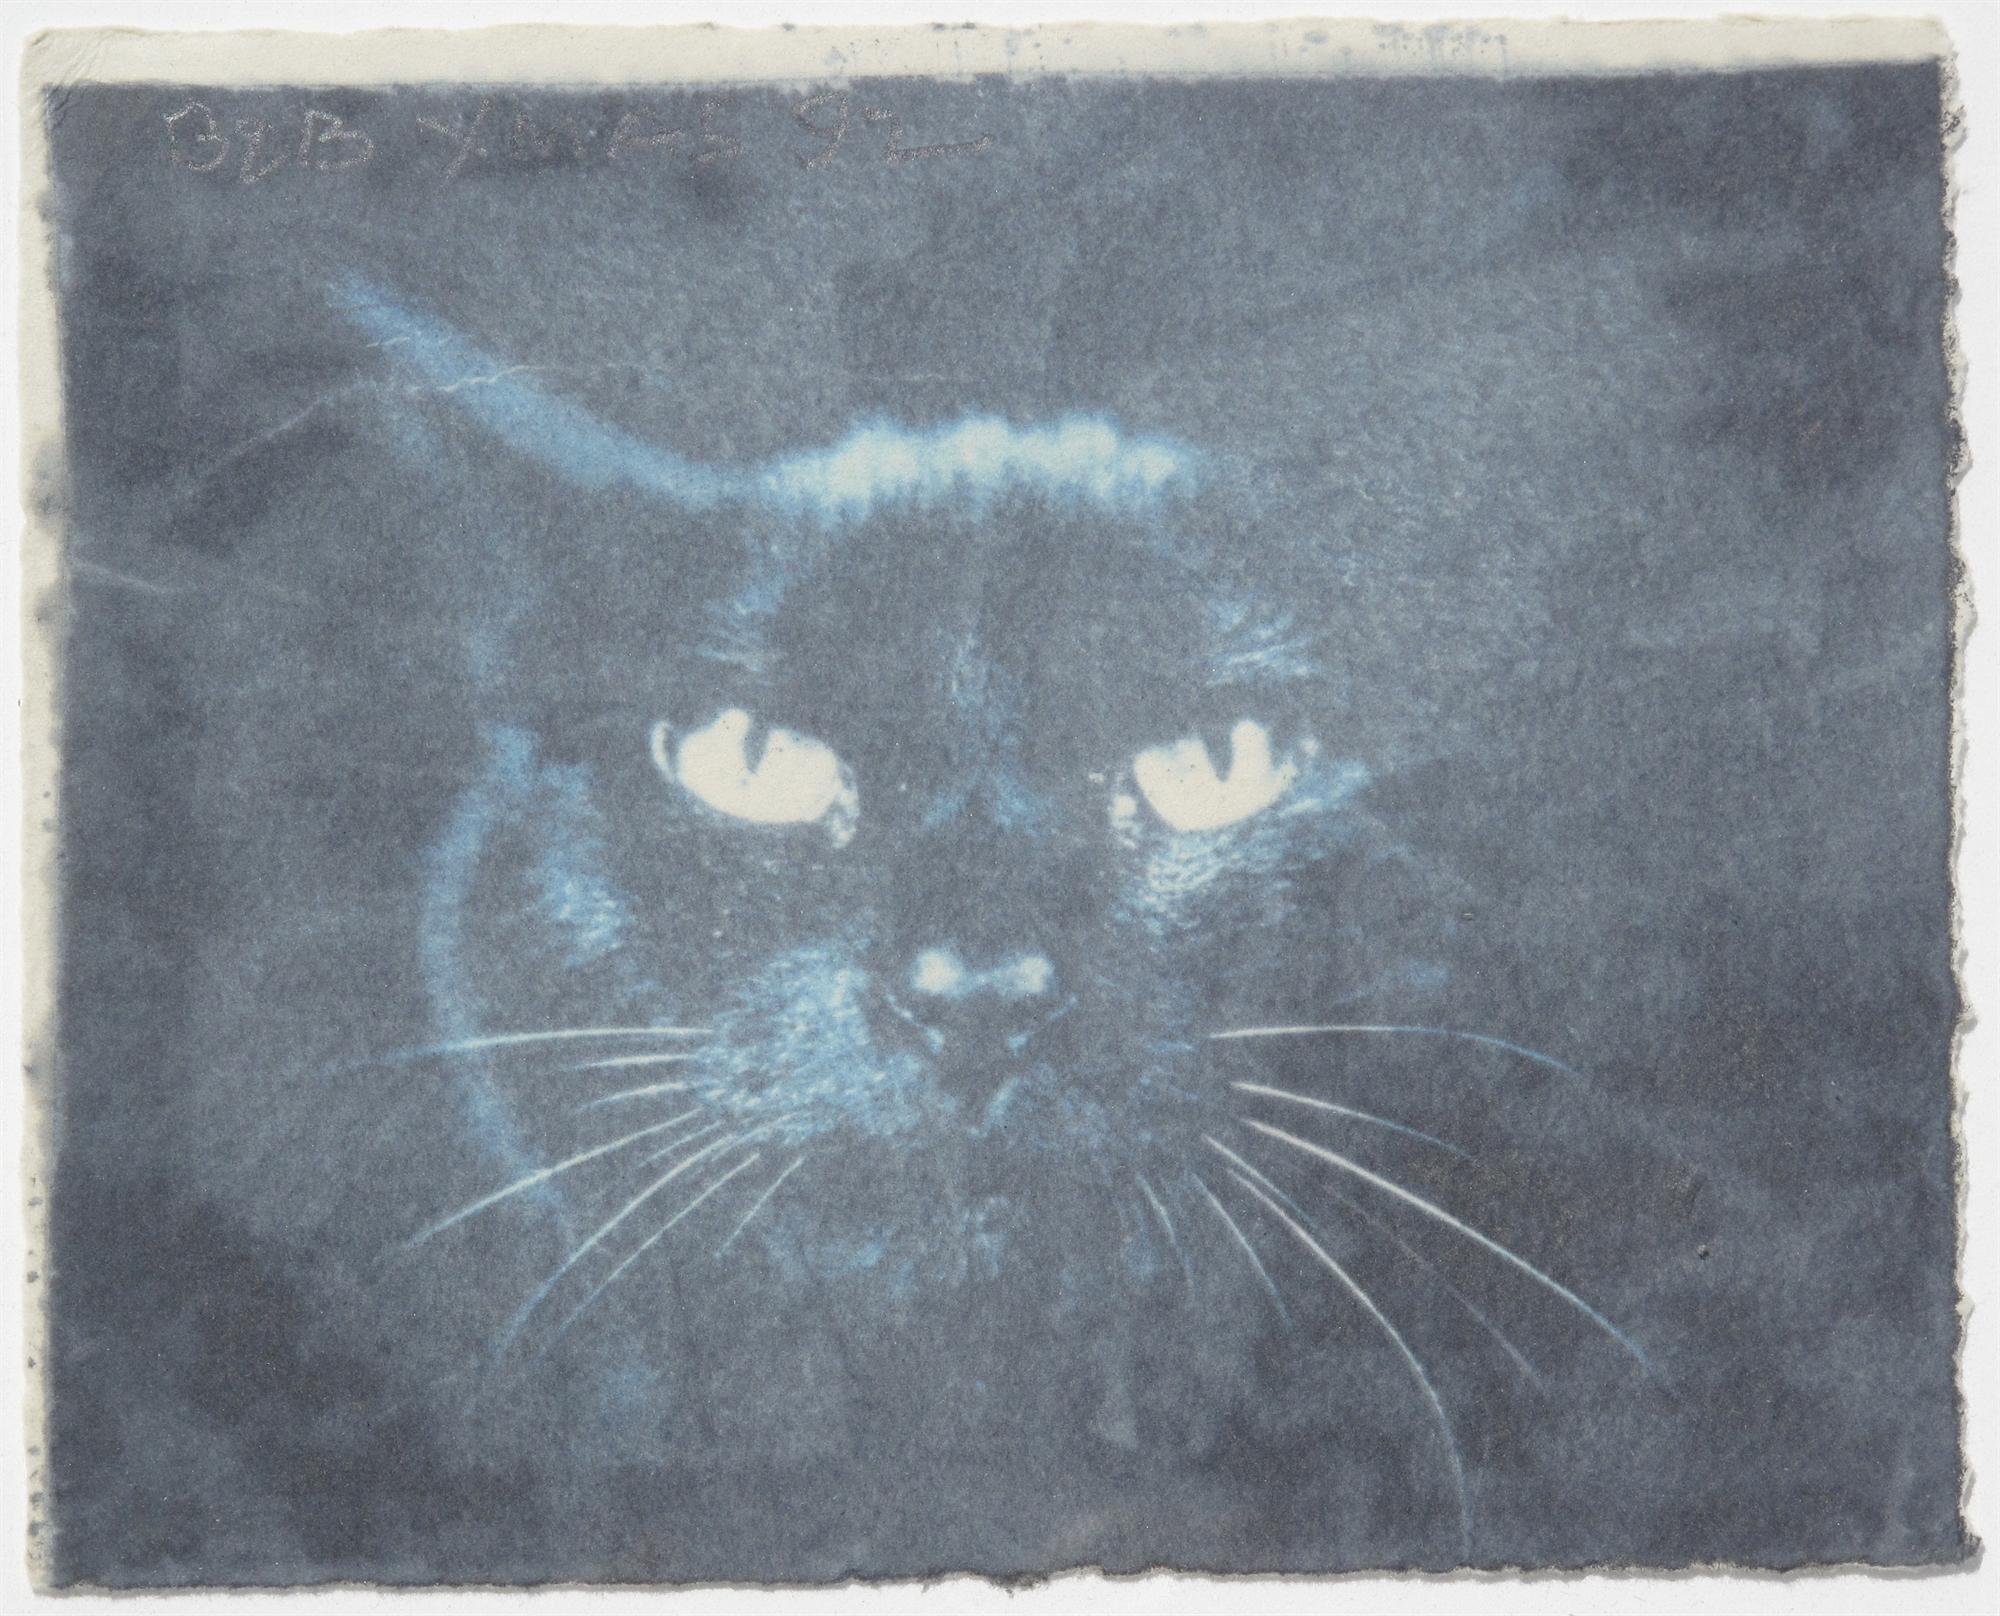 Black Cat by Robert Rauschenberg